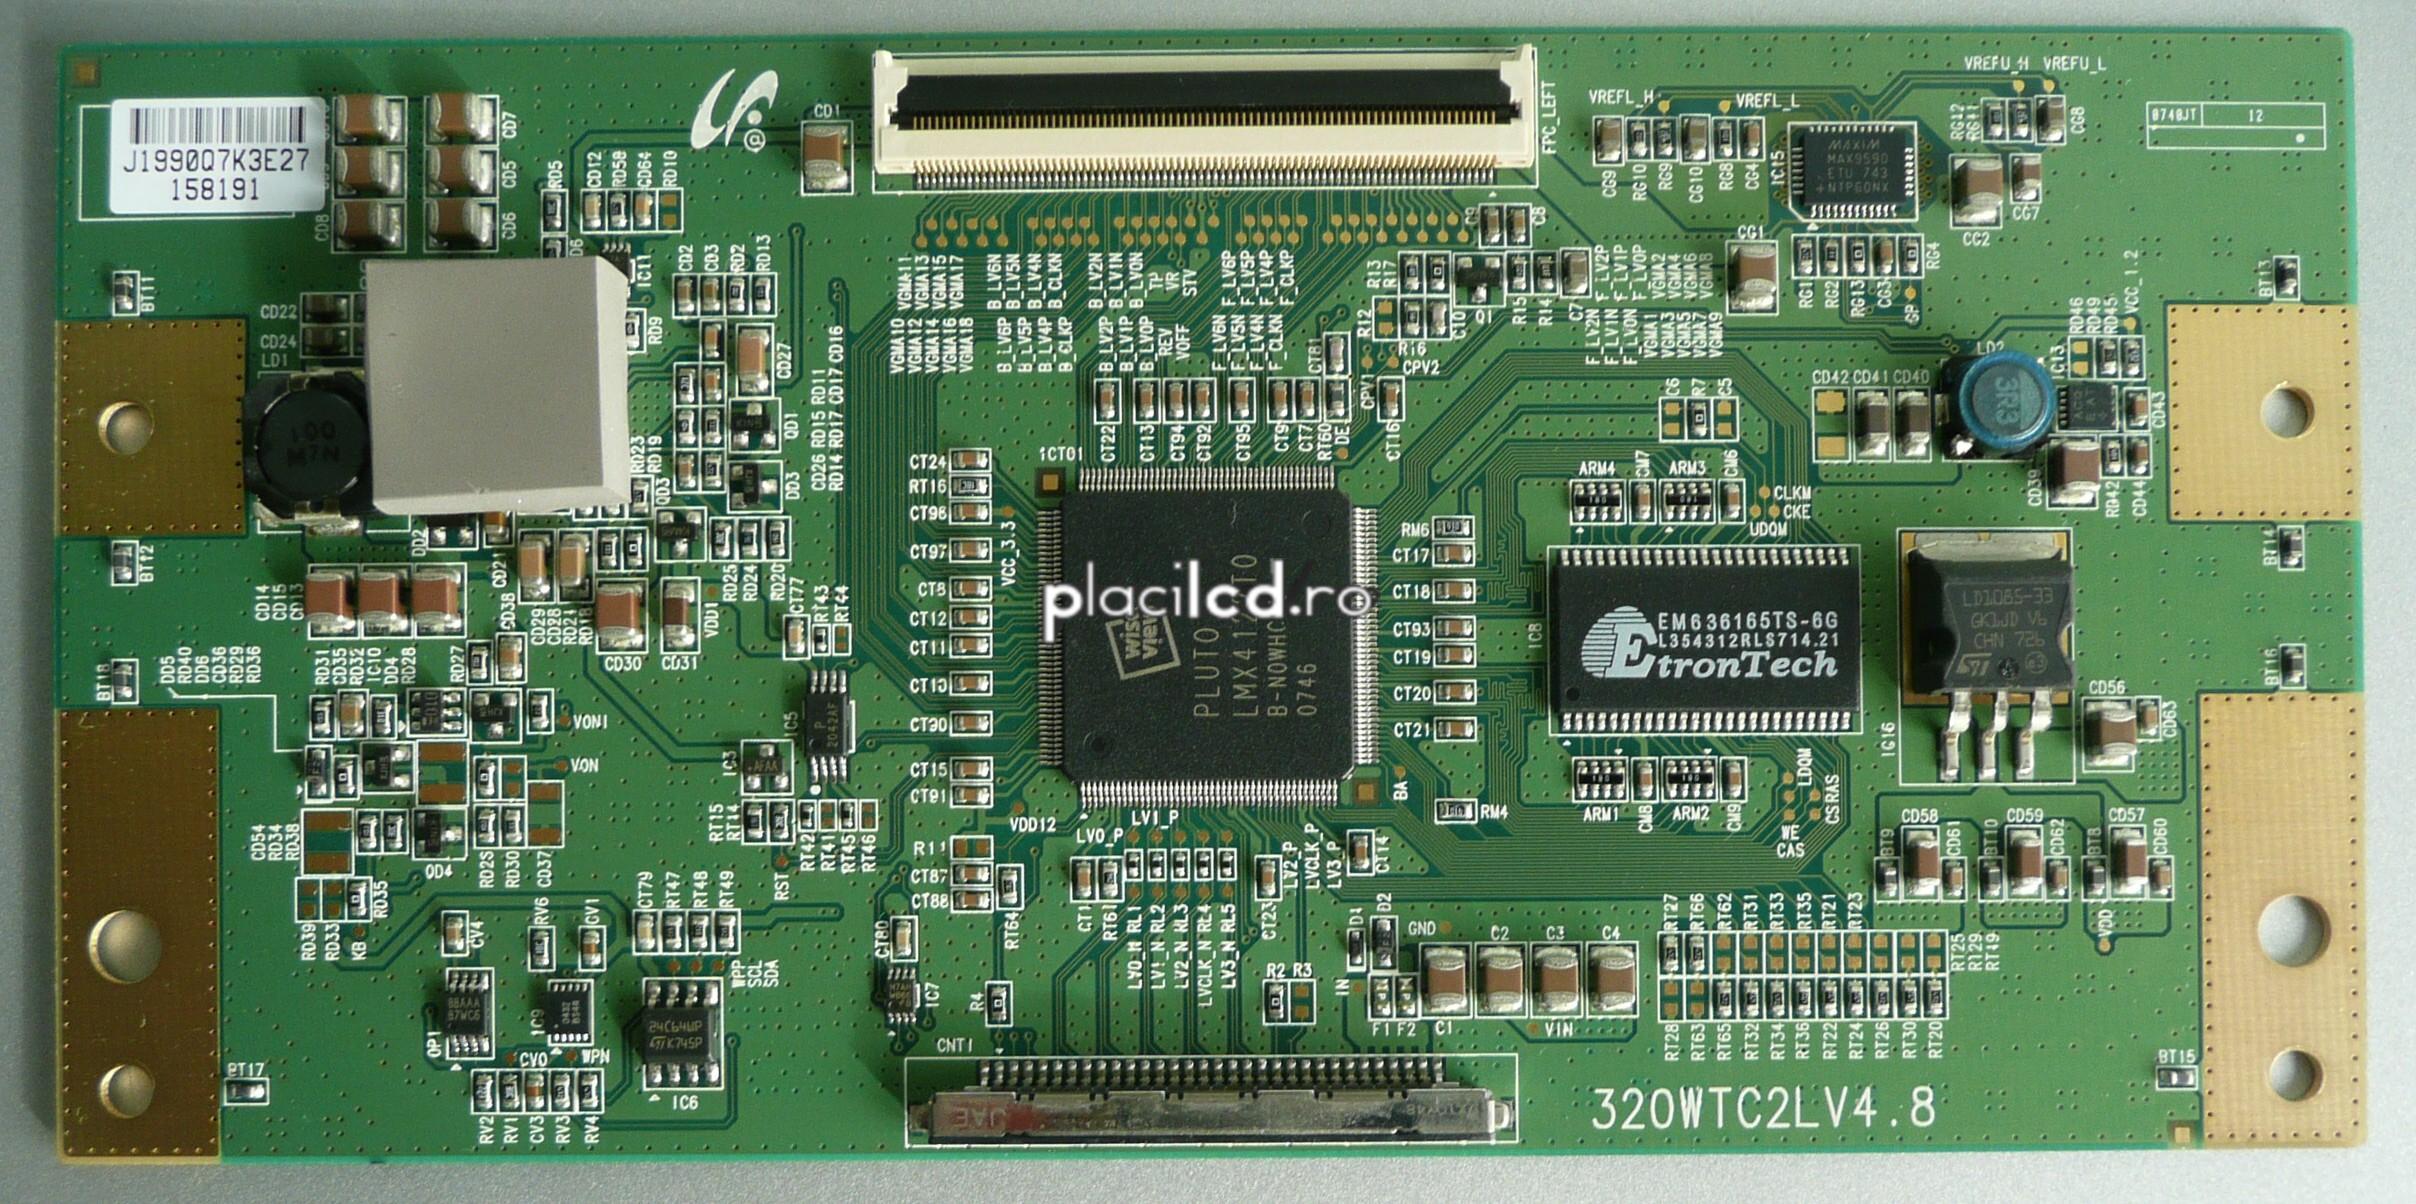 Placa LVDS 320WTC2LV4.8